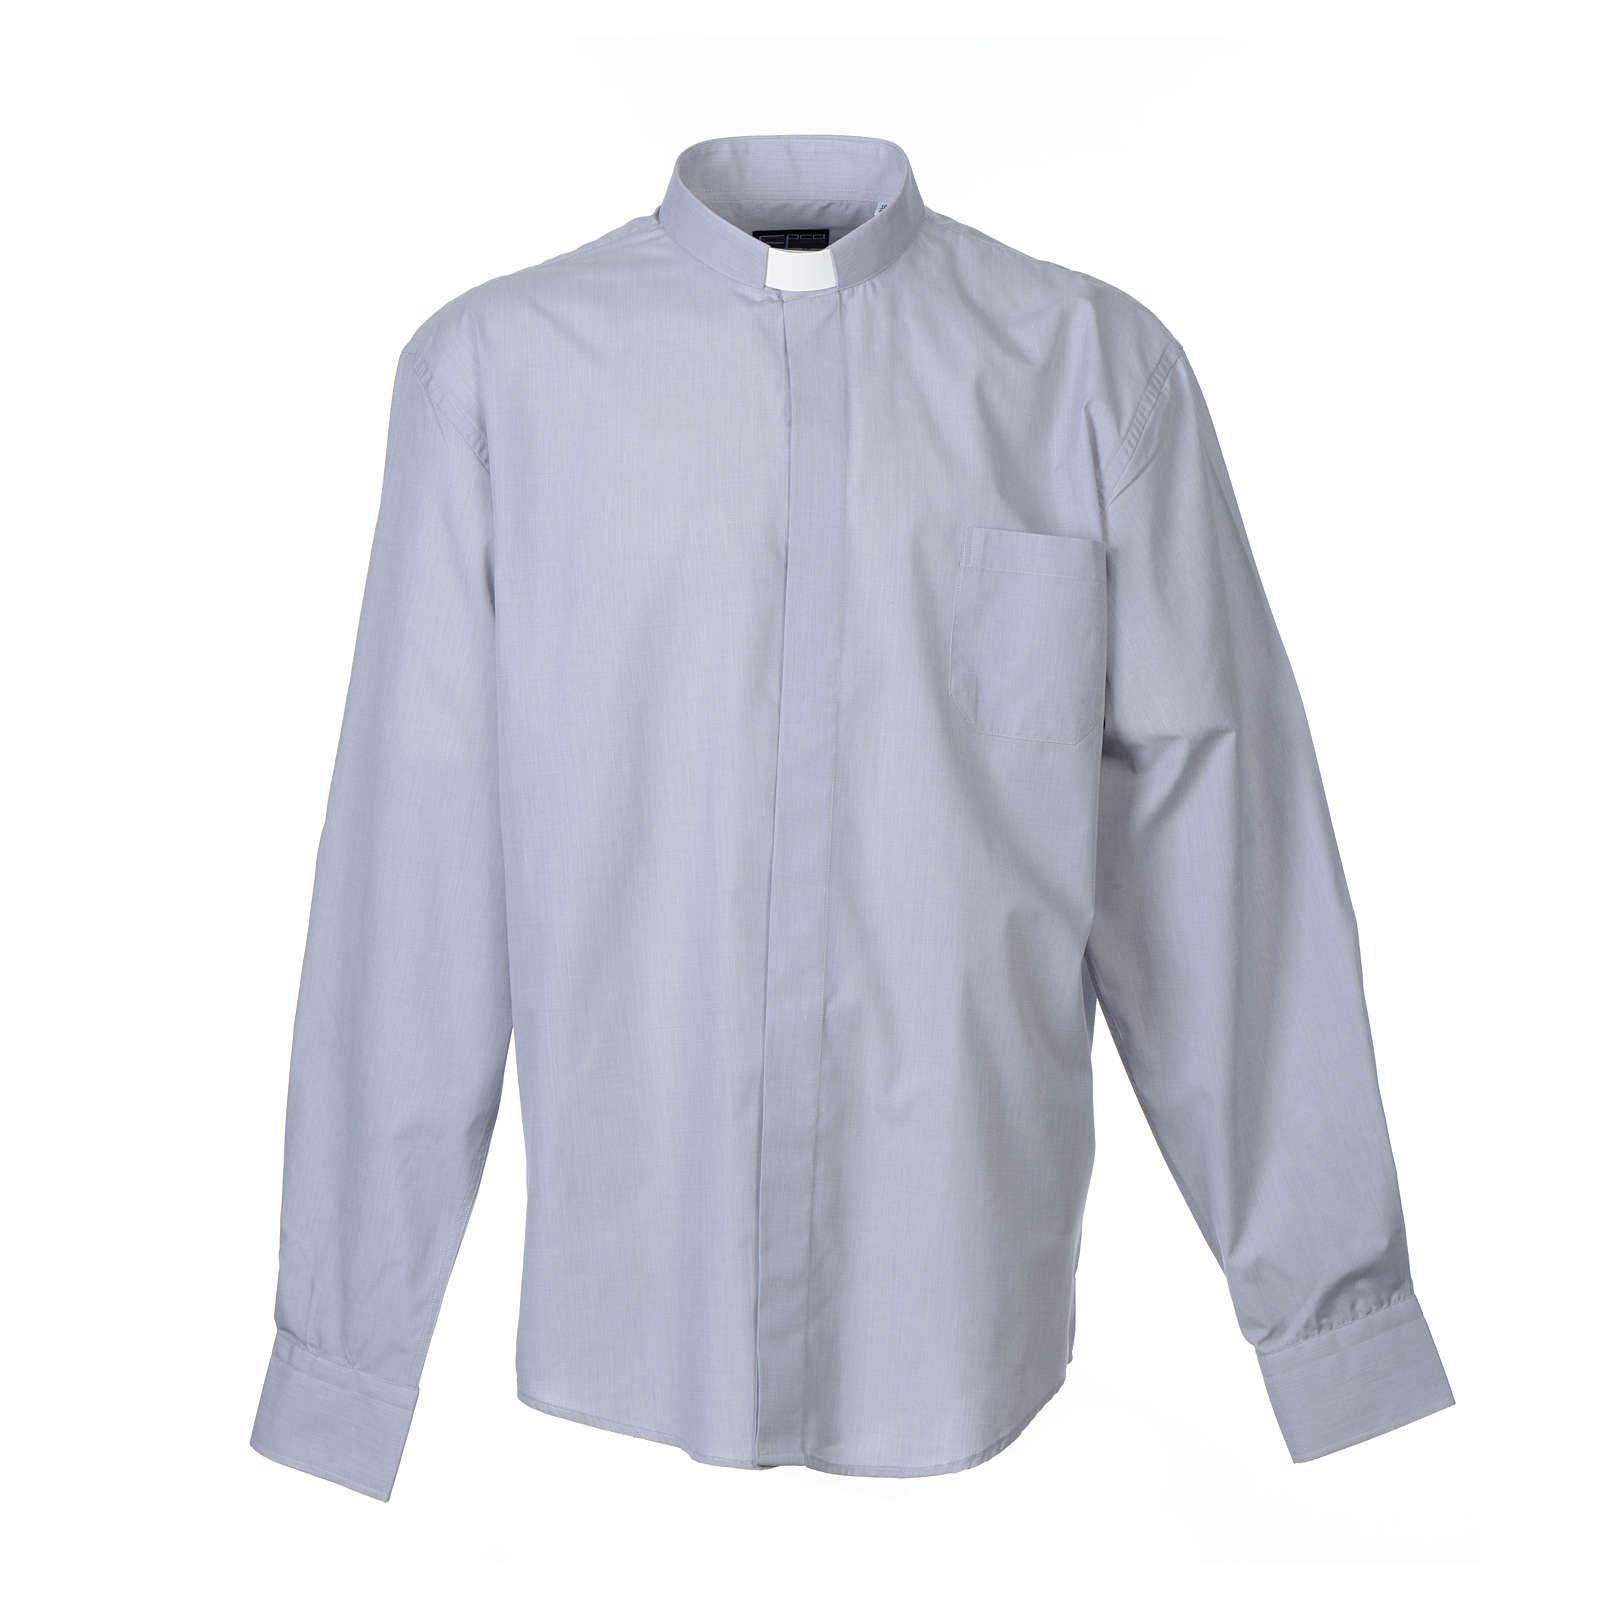 Camisa Clergy Manga Larga Hilo a Hilo, Mixto Algodón Gris Claro 4